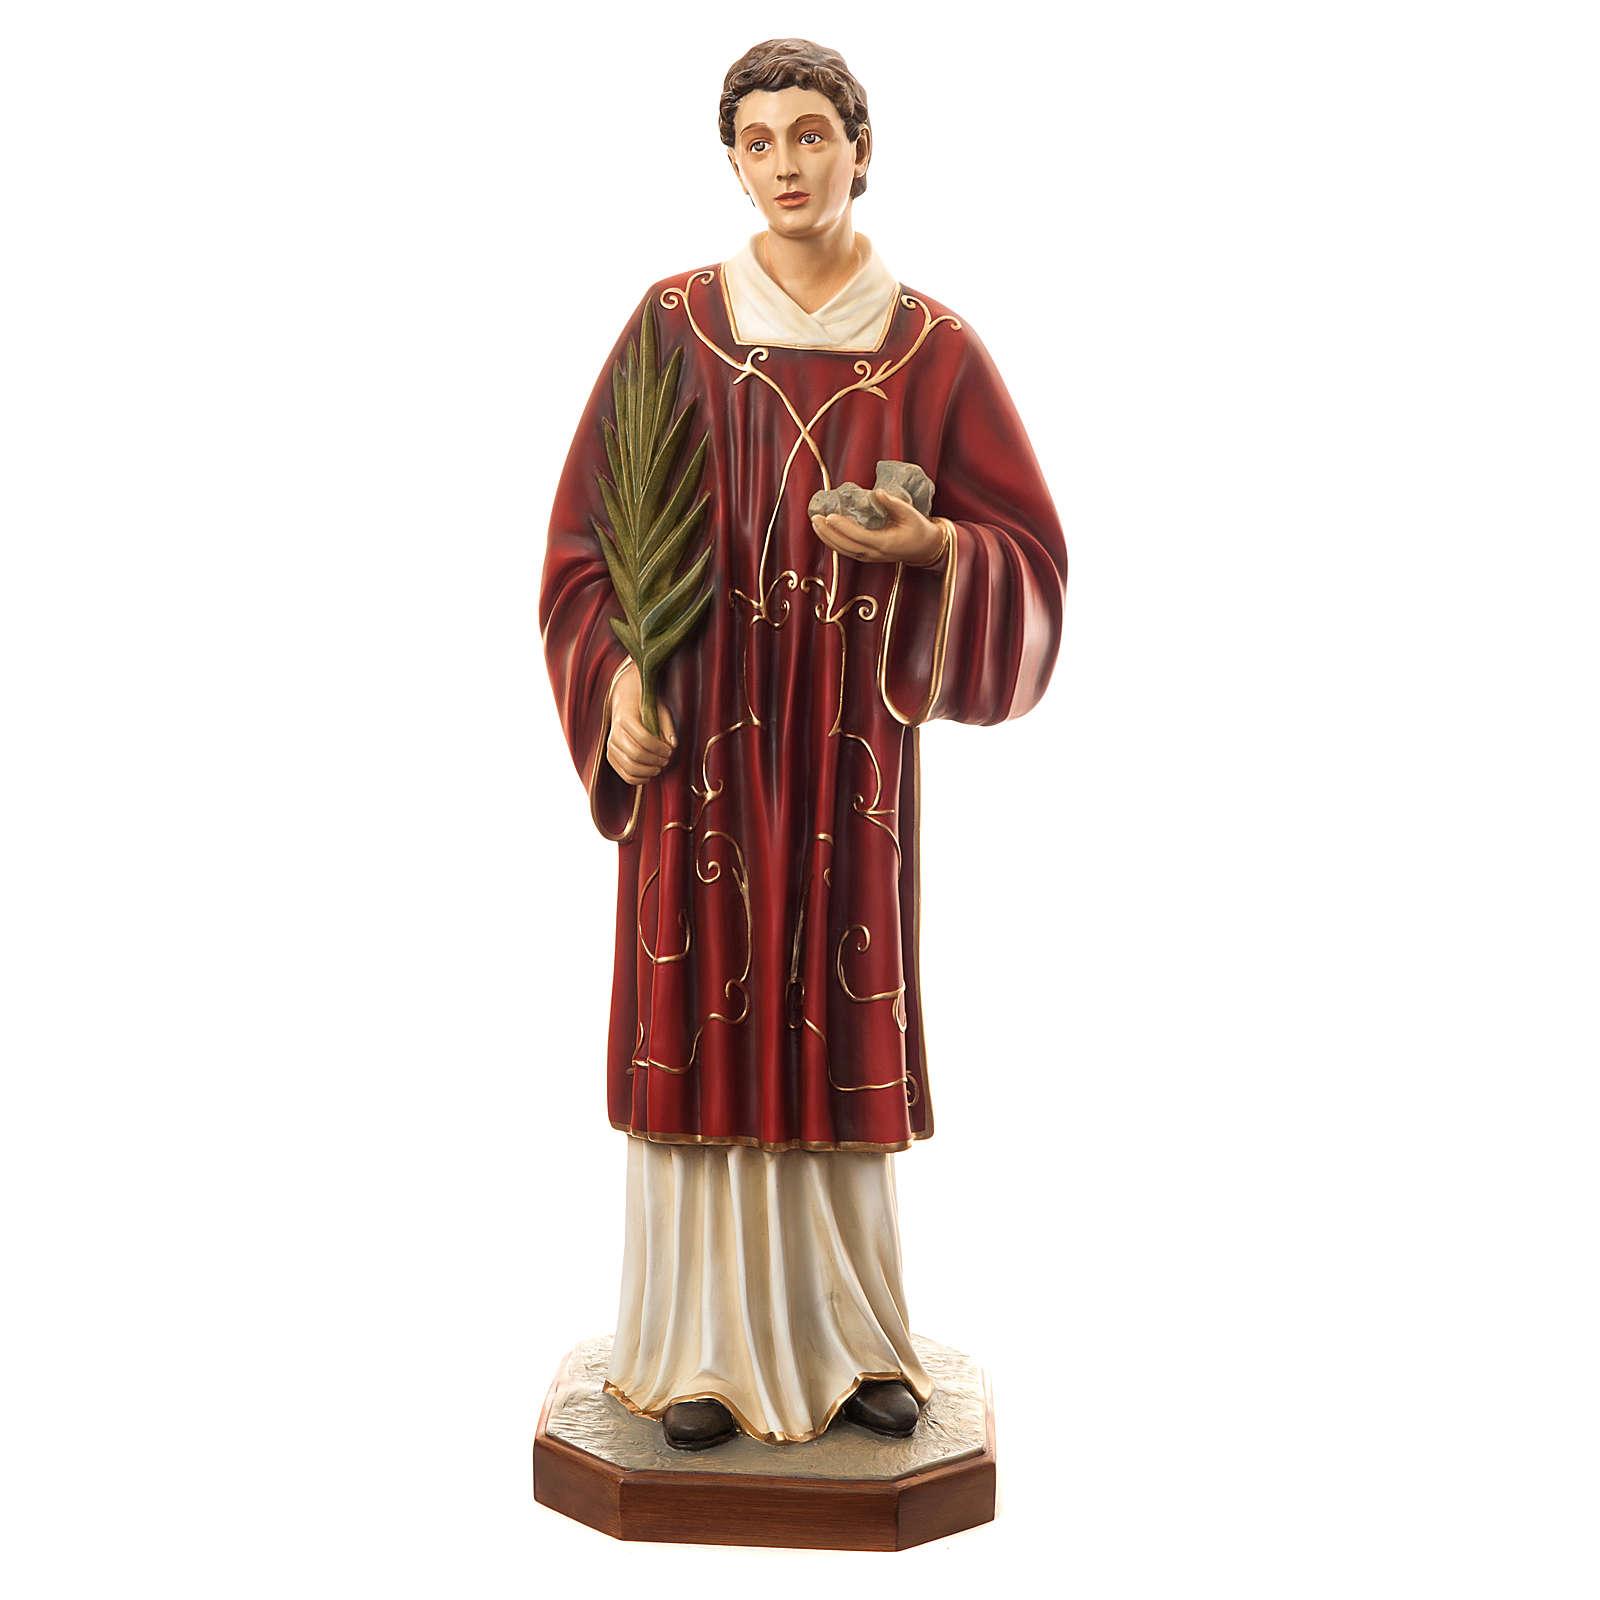 Santo Stefano 110 cm vetroresina dipinta finitura speciale 4